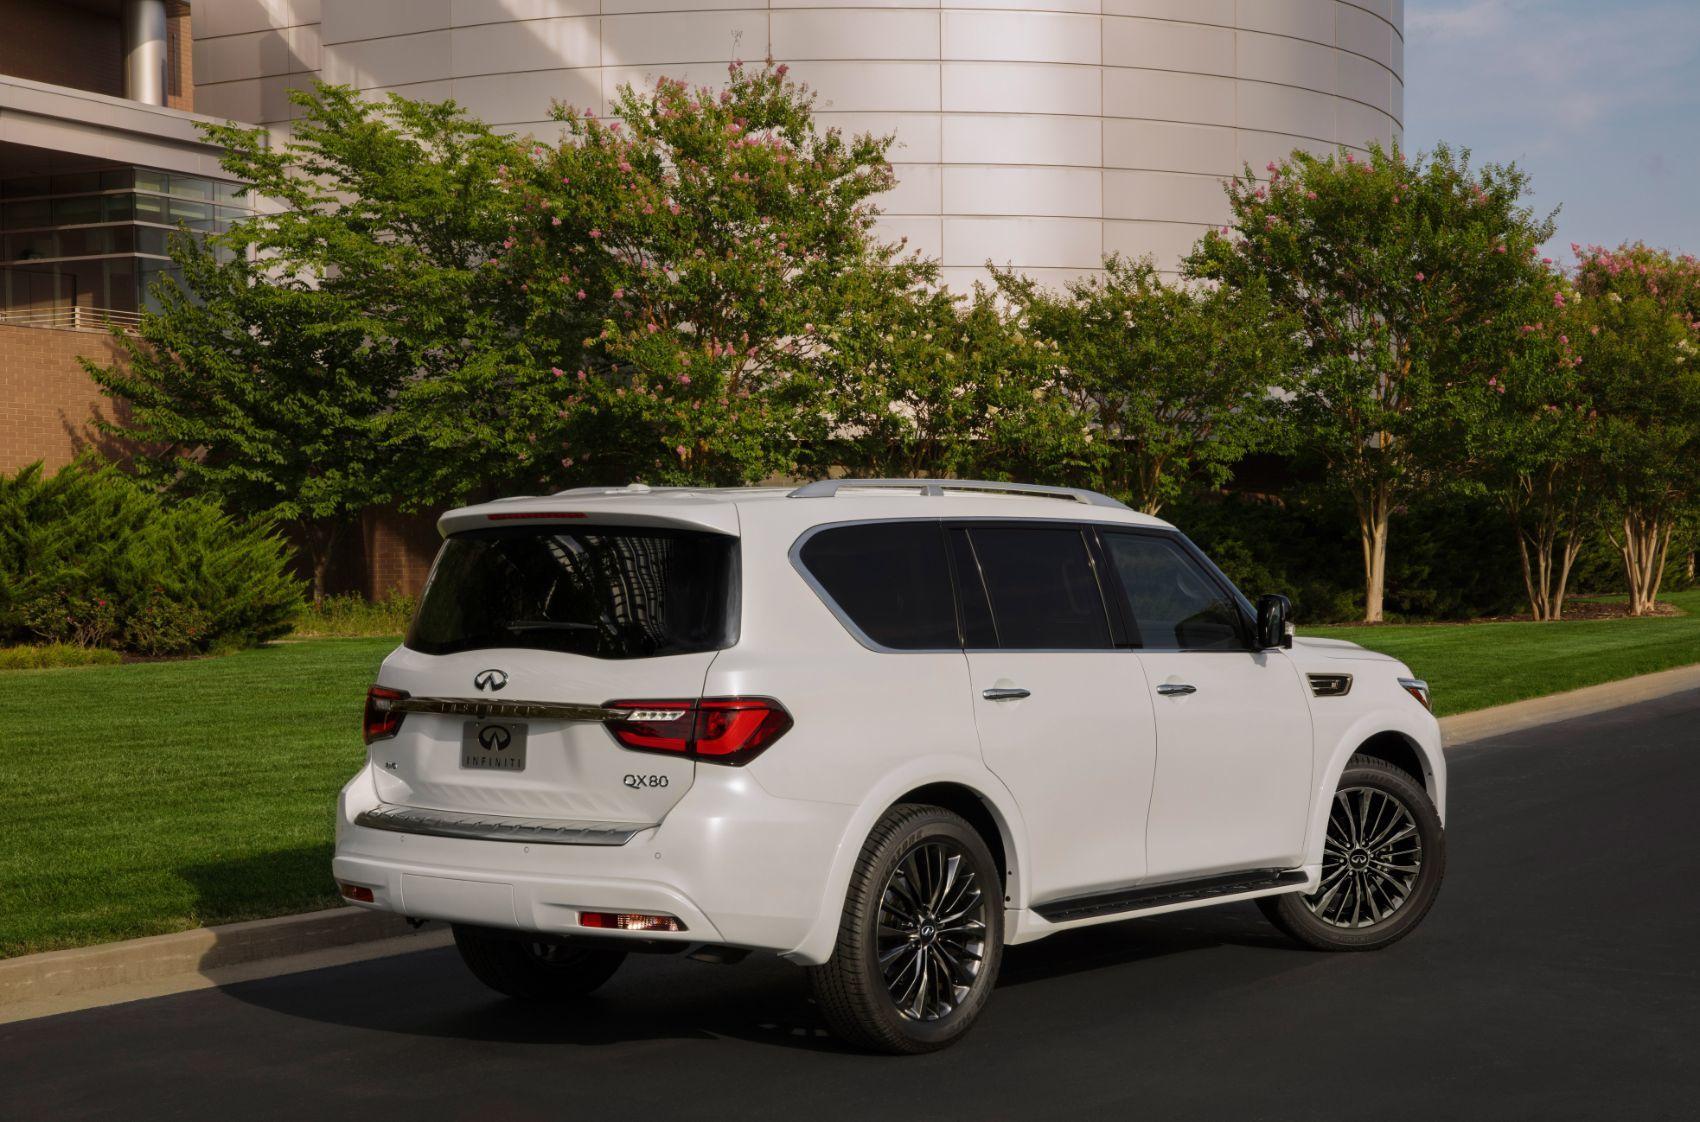 2021 infiniti qx80 trim levels pricing info  other